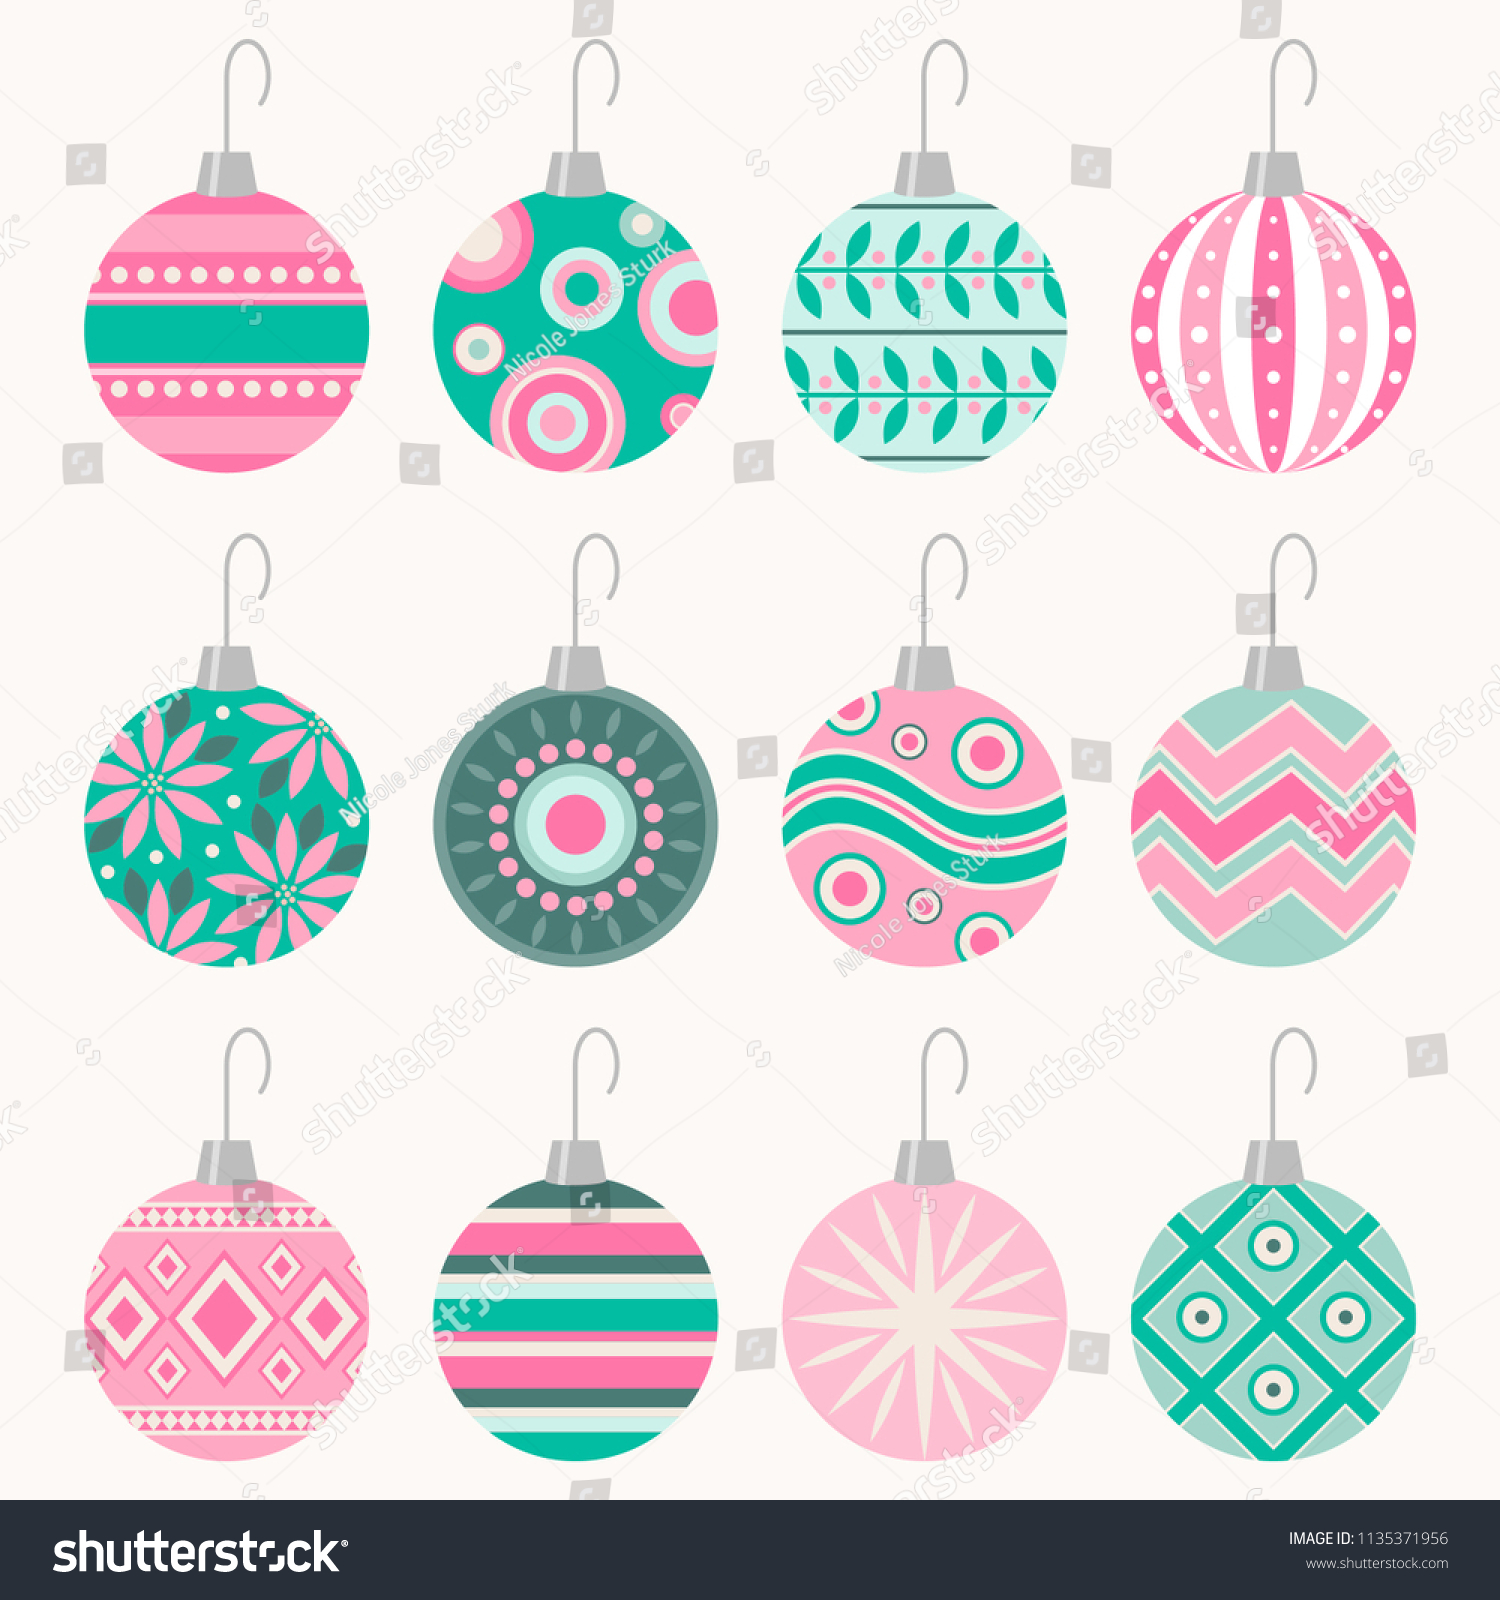 Christmas Ornaments Vector.Retro Christmas Ornaments Vector Art Set Nicole Jones Sturk